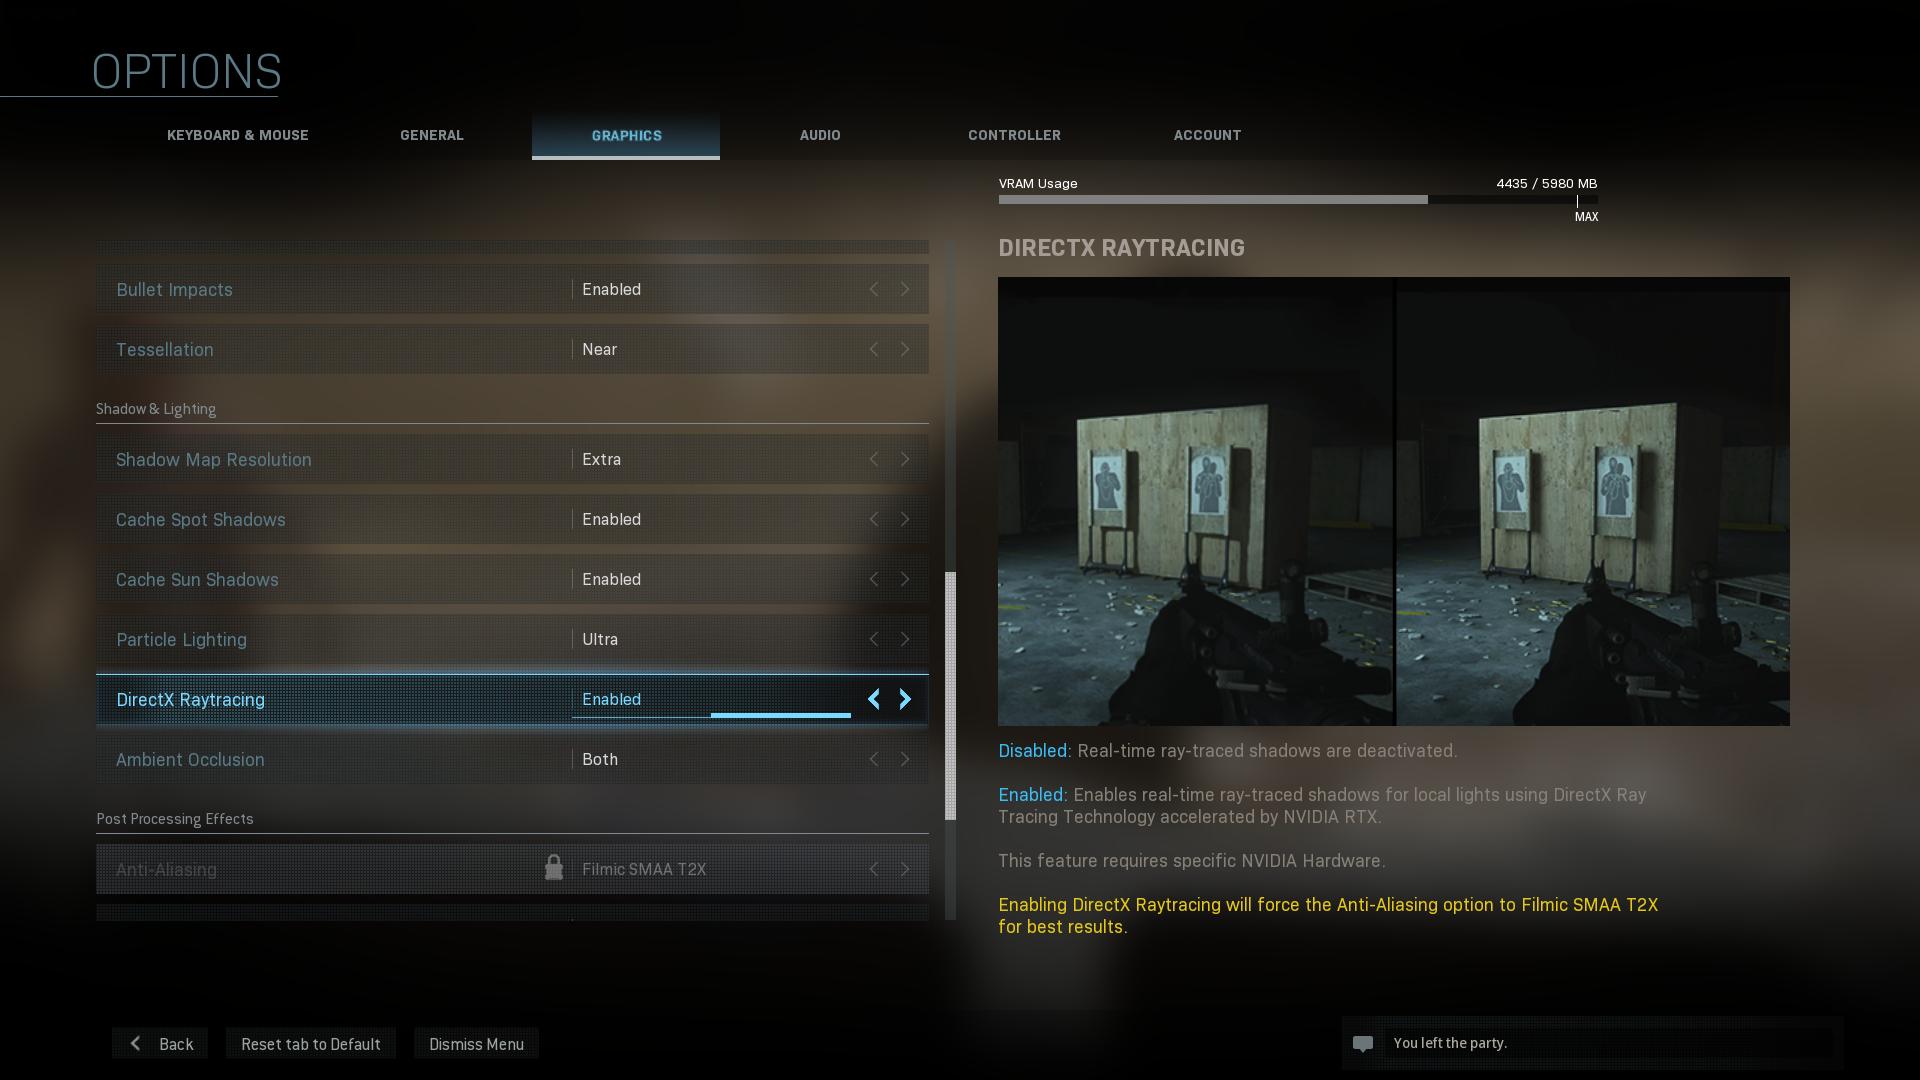 https://assets.rockpapershotgun.com/images/2019/10/Call-of-Duty-Modern-Warfare-RTX-setting.png